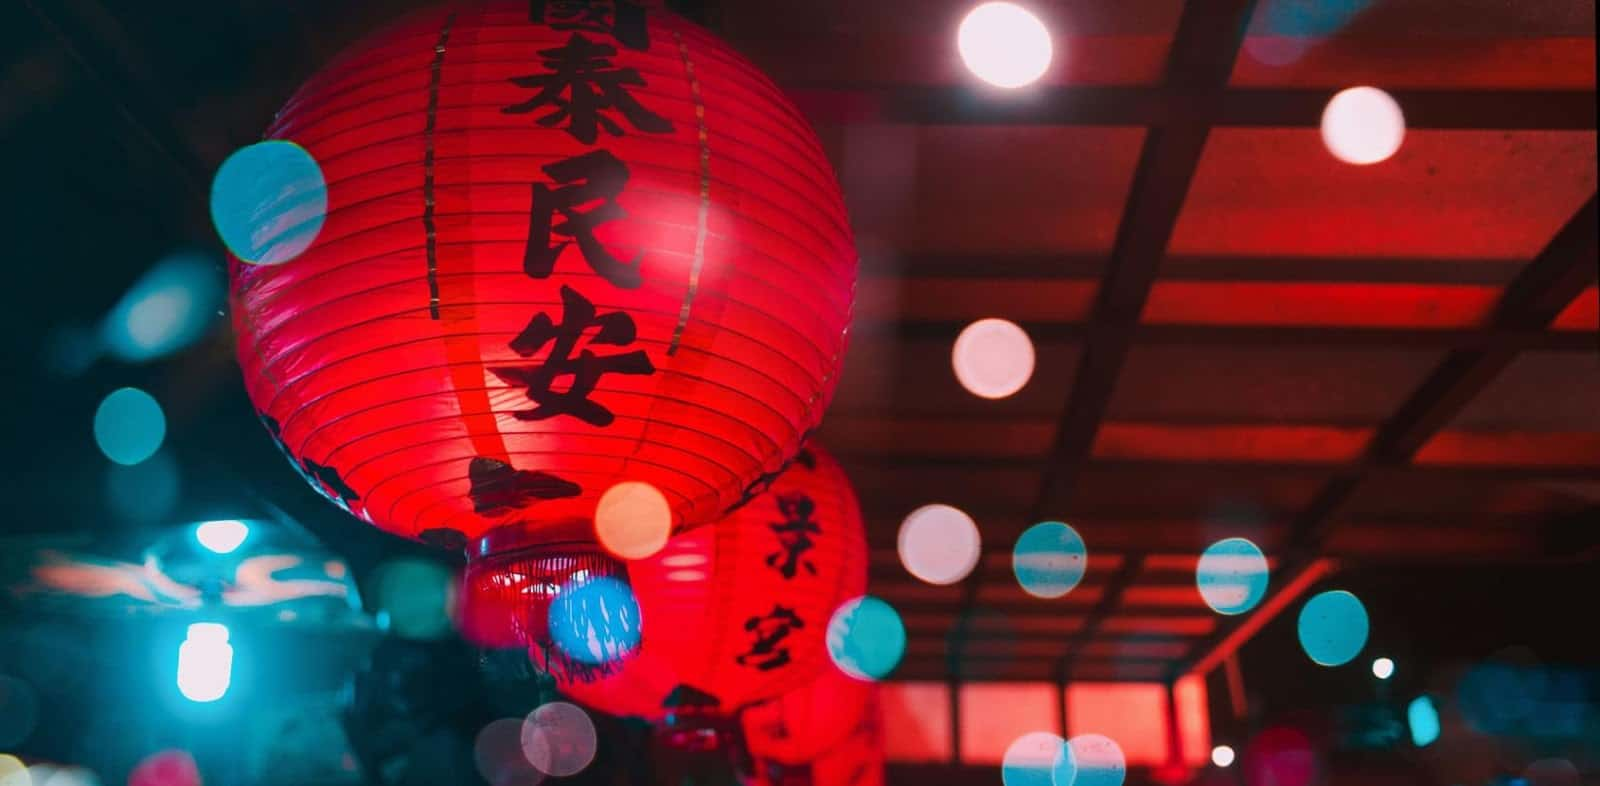 chinese new year impact on logistics